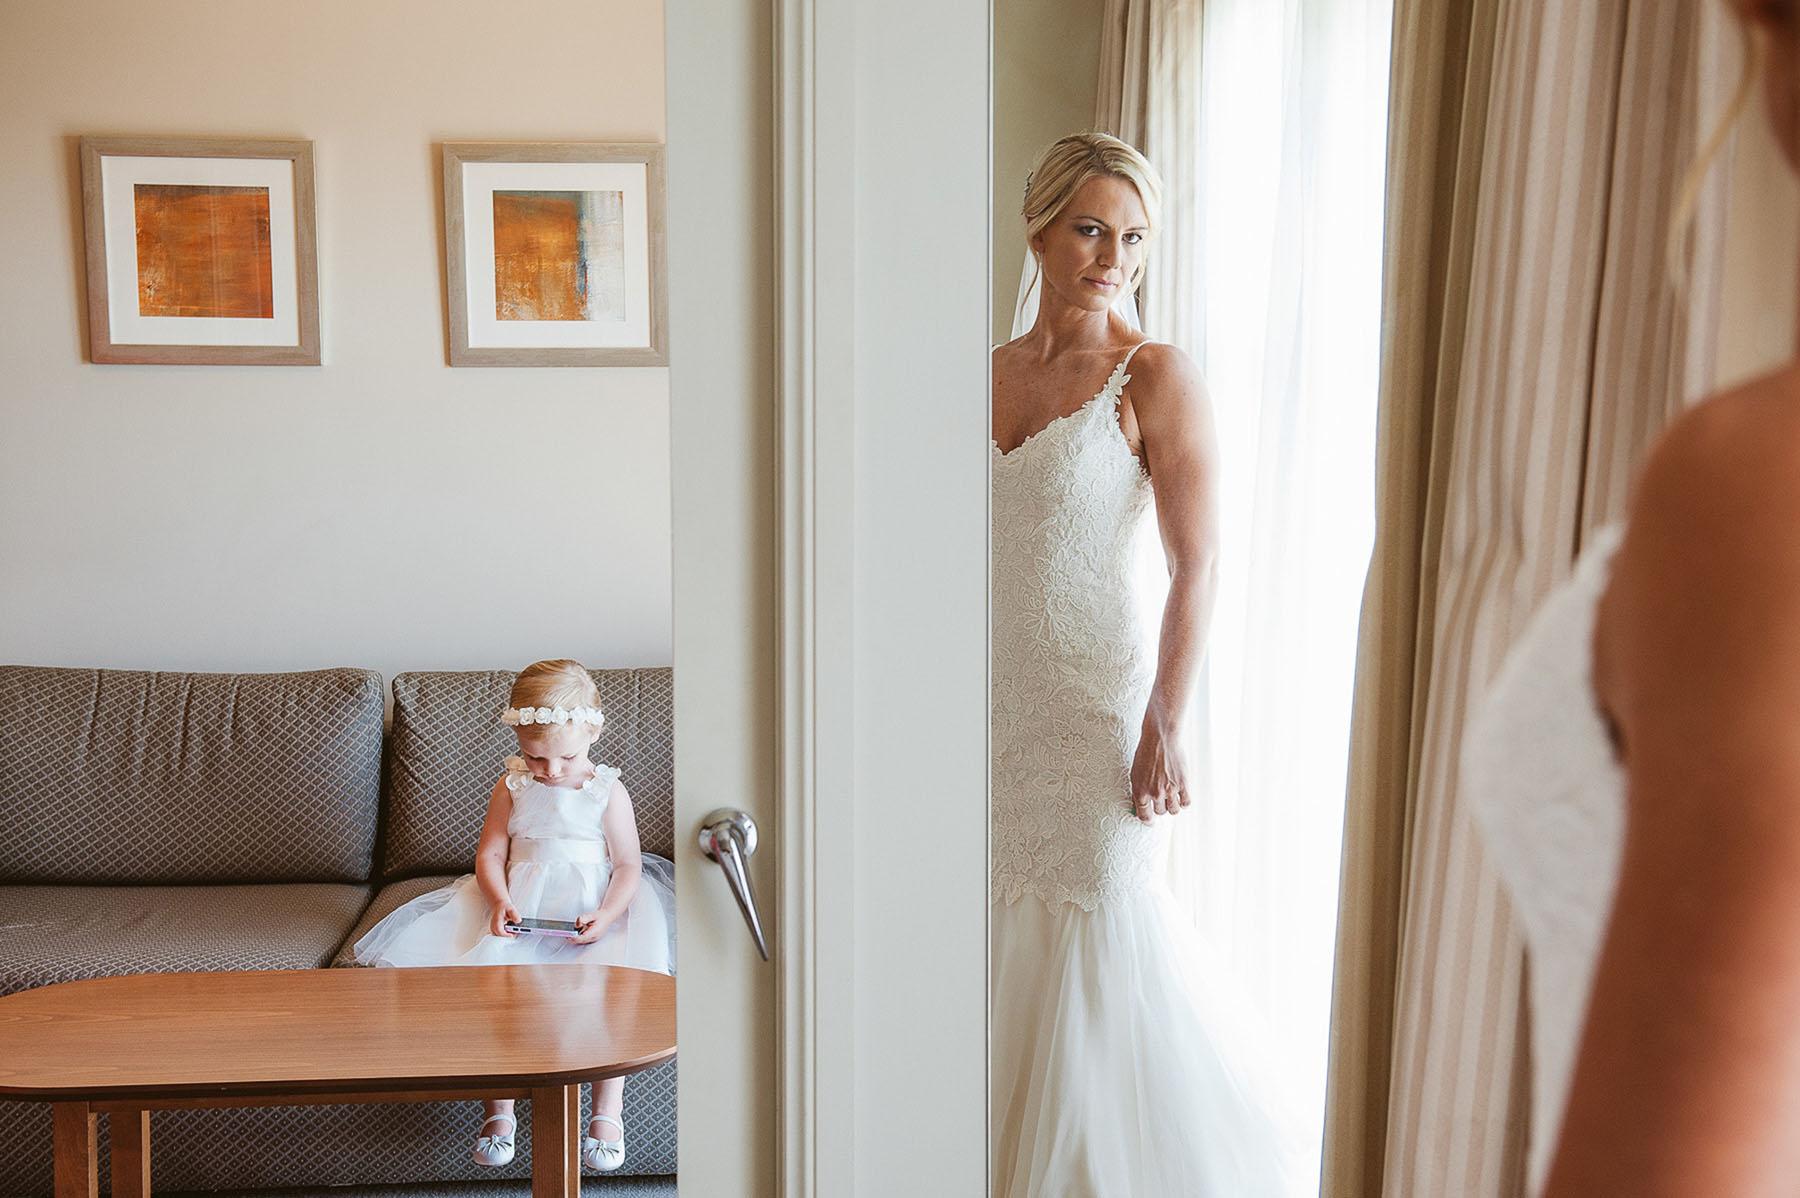 Marryme_wedding_photography_dorrigo_bellingen_photographer_37.jpg